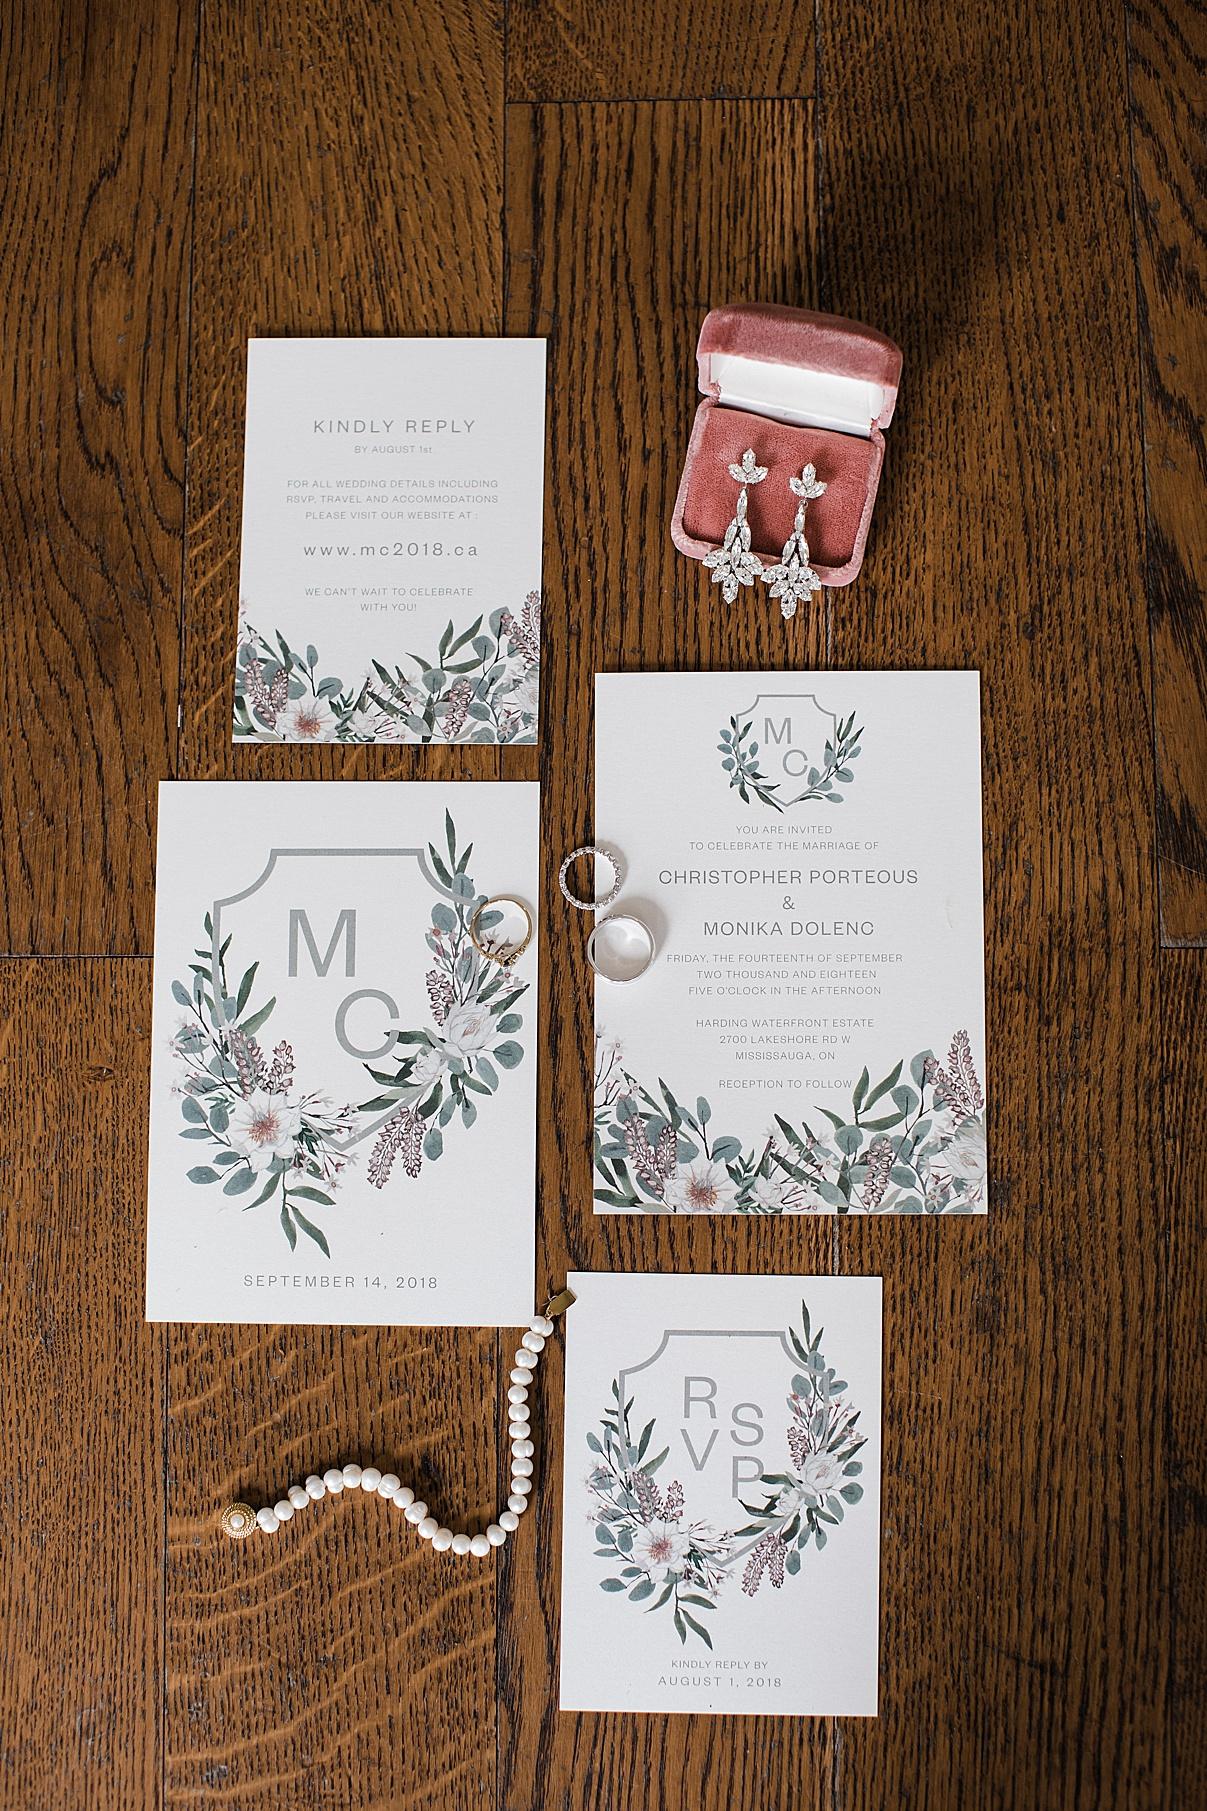 Wedding Invitations | Harding Waterfront Estate Wedding| Ontario wedding photographer| Toronto wedding photographer| 3 Photography | 3photography.ca